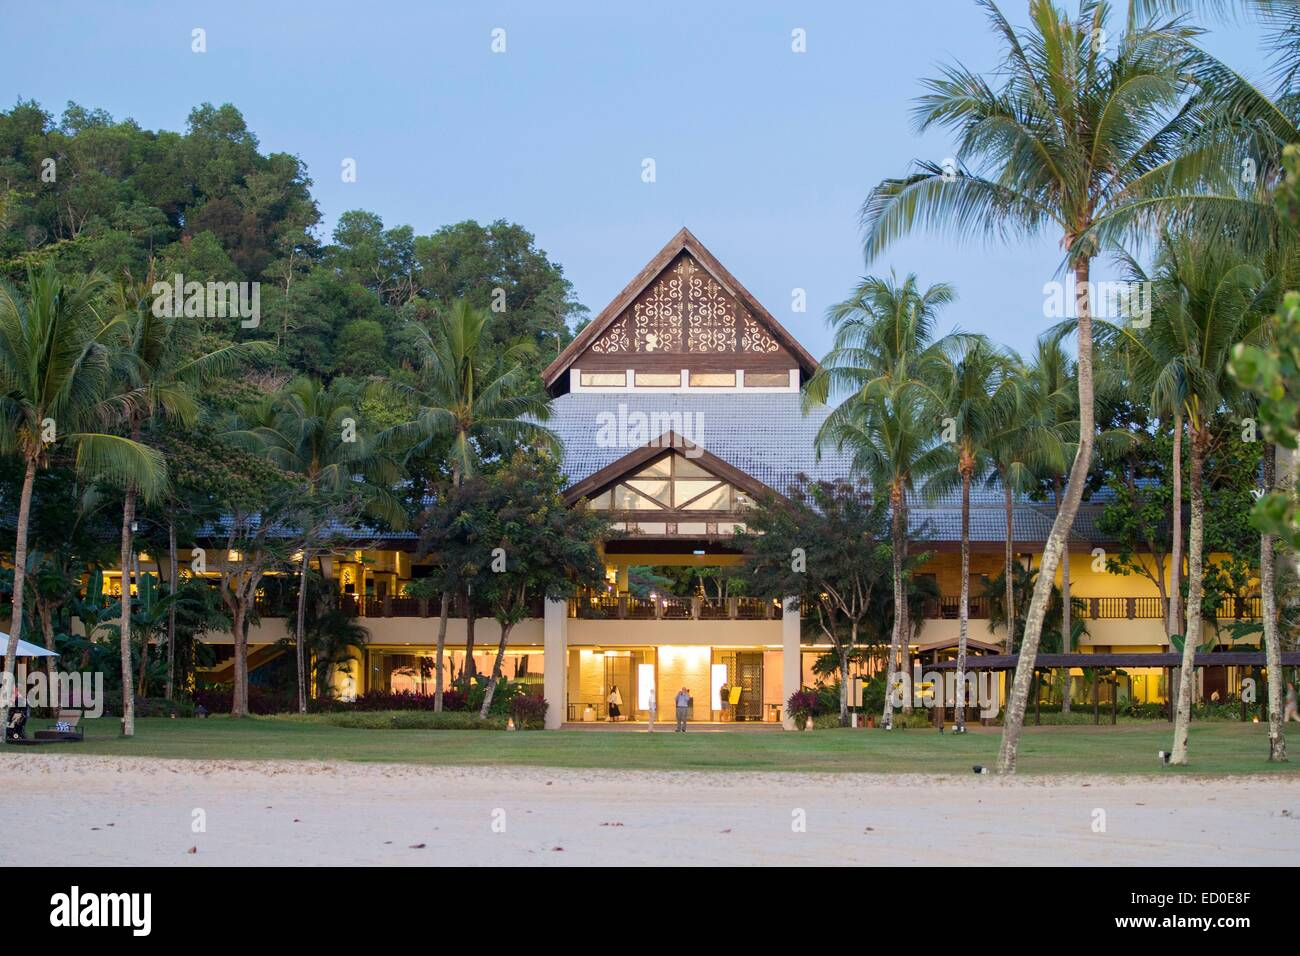 Malaysia, Sabah state, Kota Kinabalu, Shangri-La Resort - Stock Image